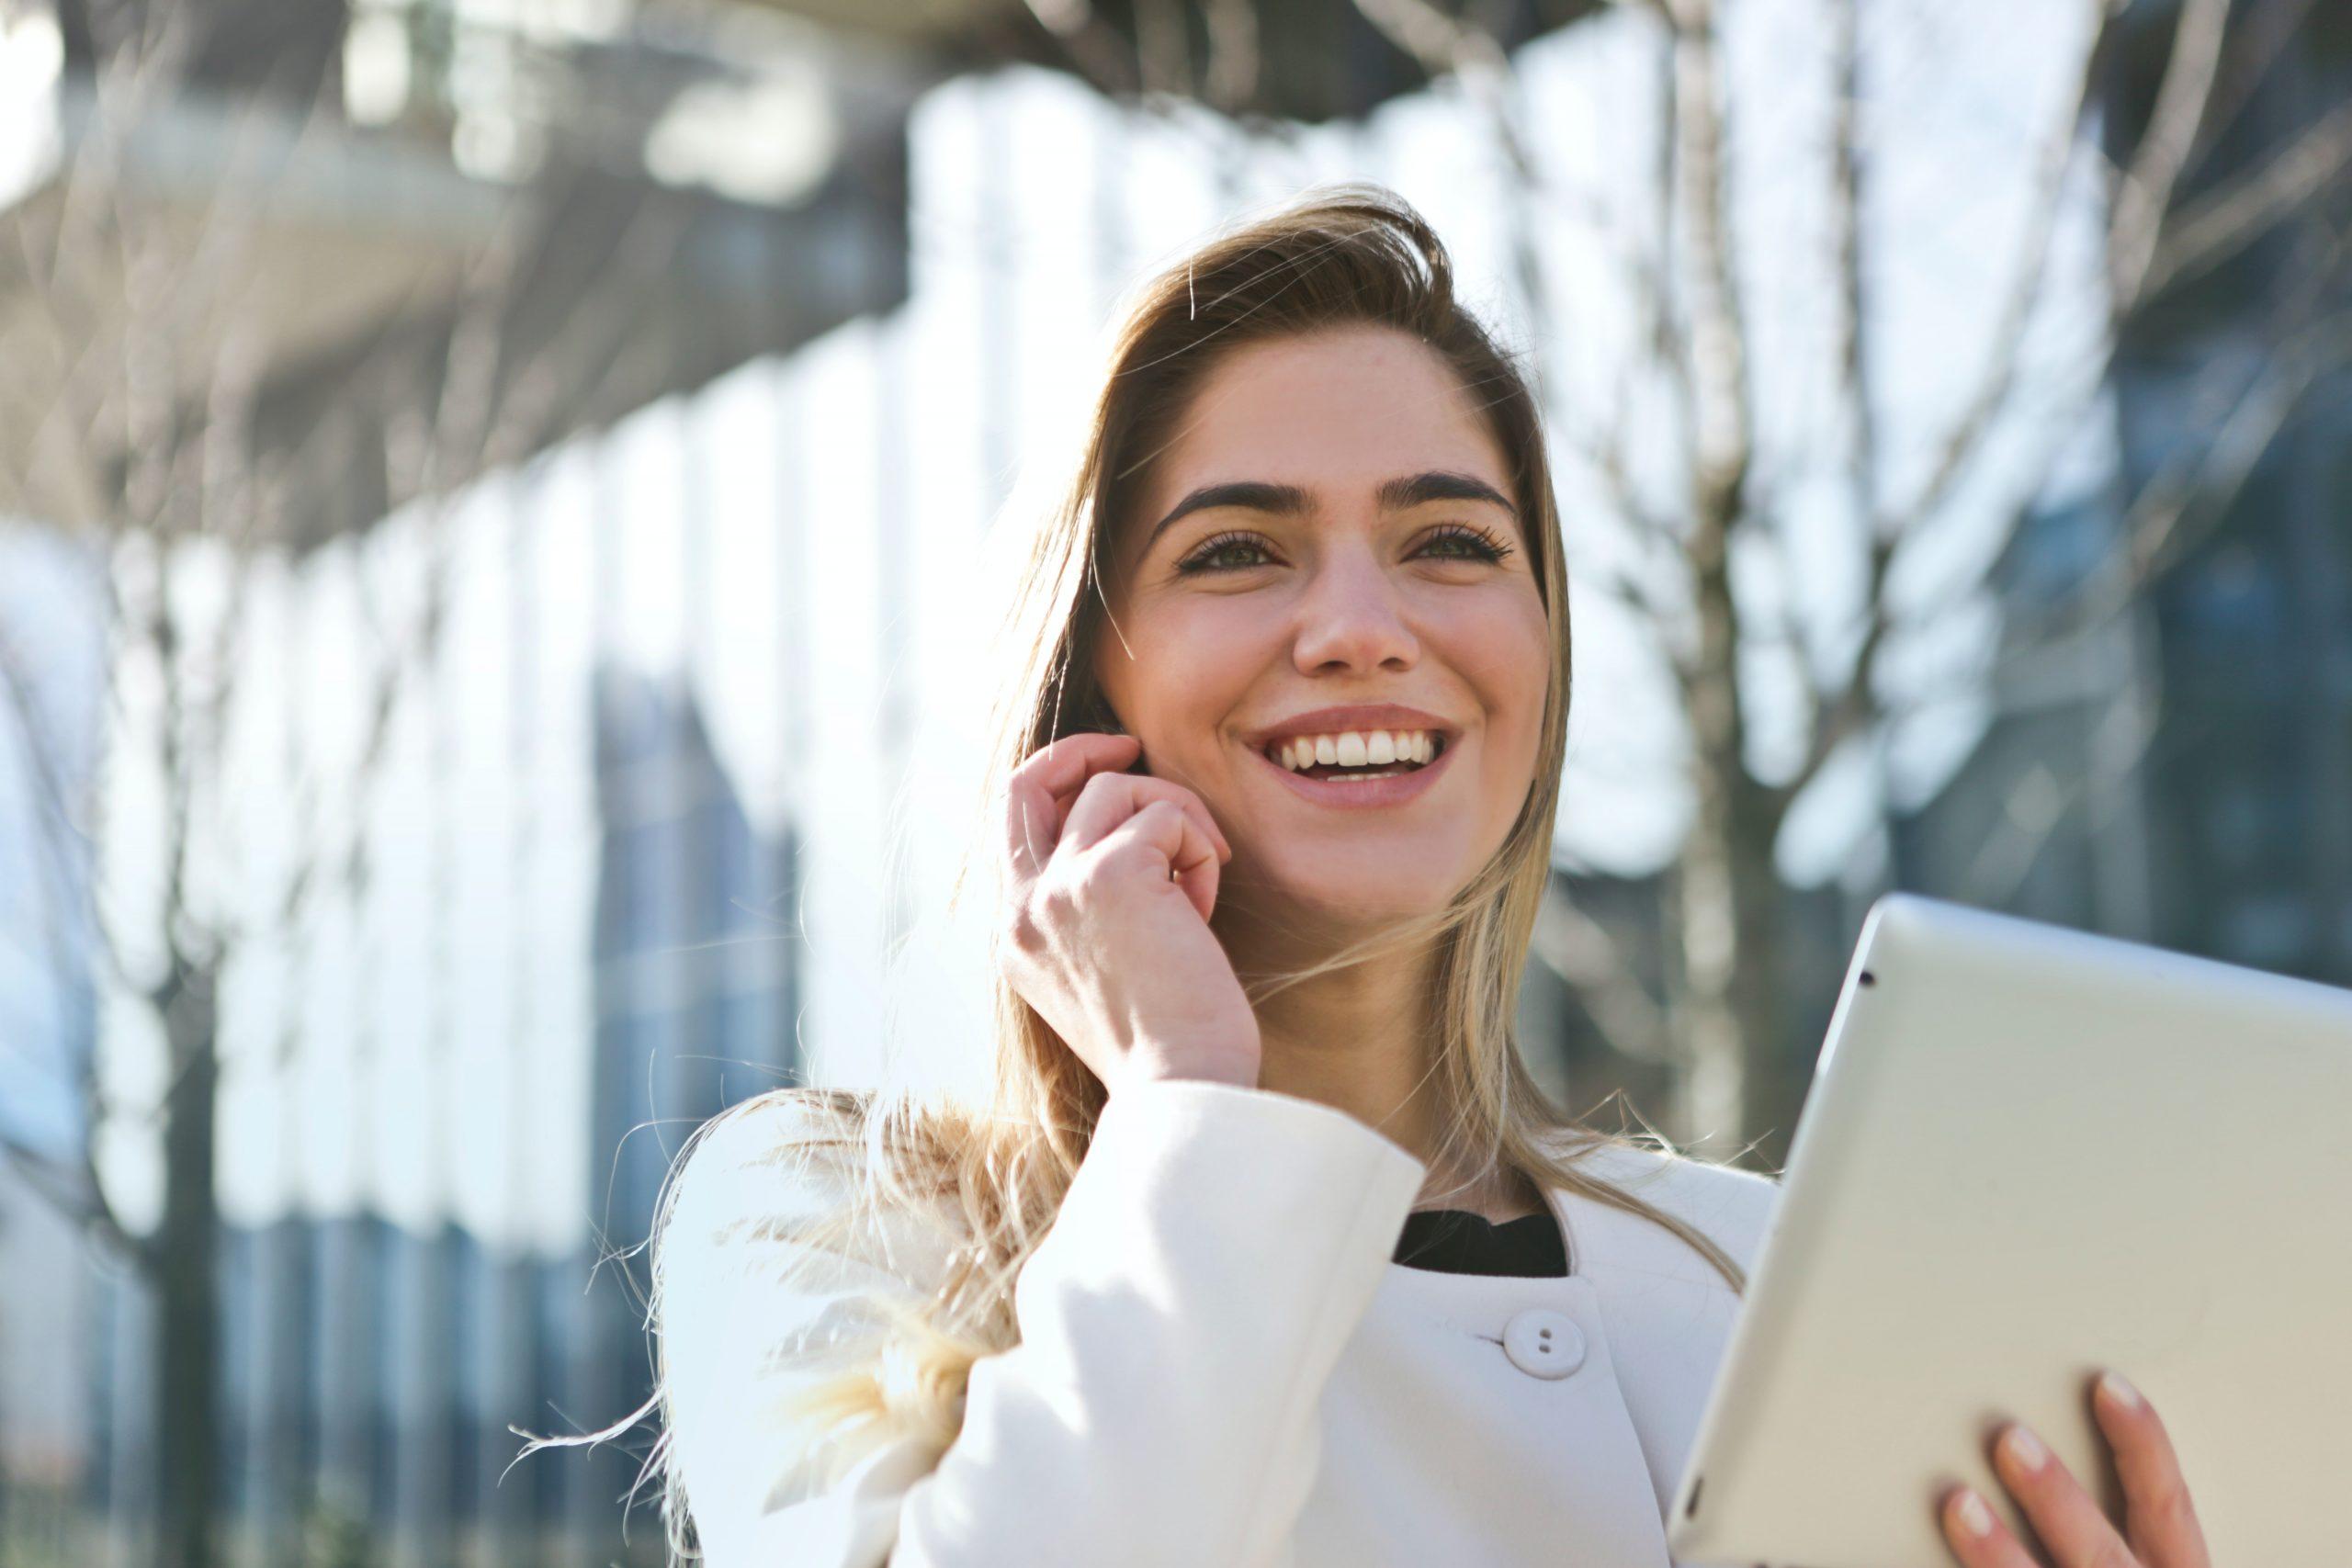 Make More Money From Surveys With Branded Elite